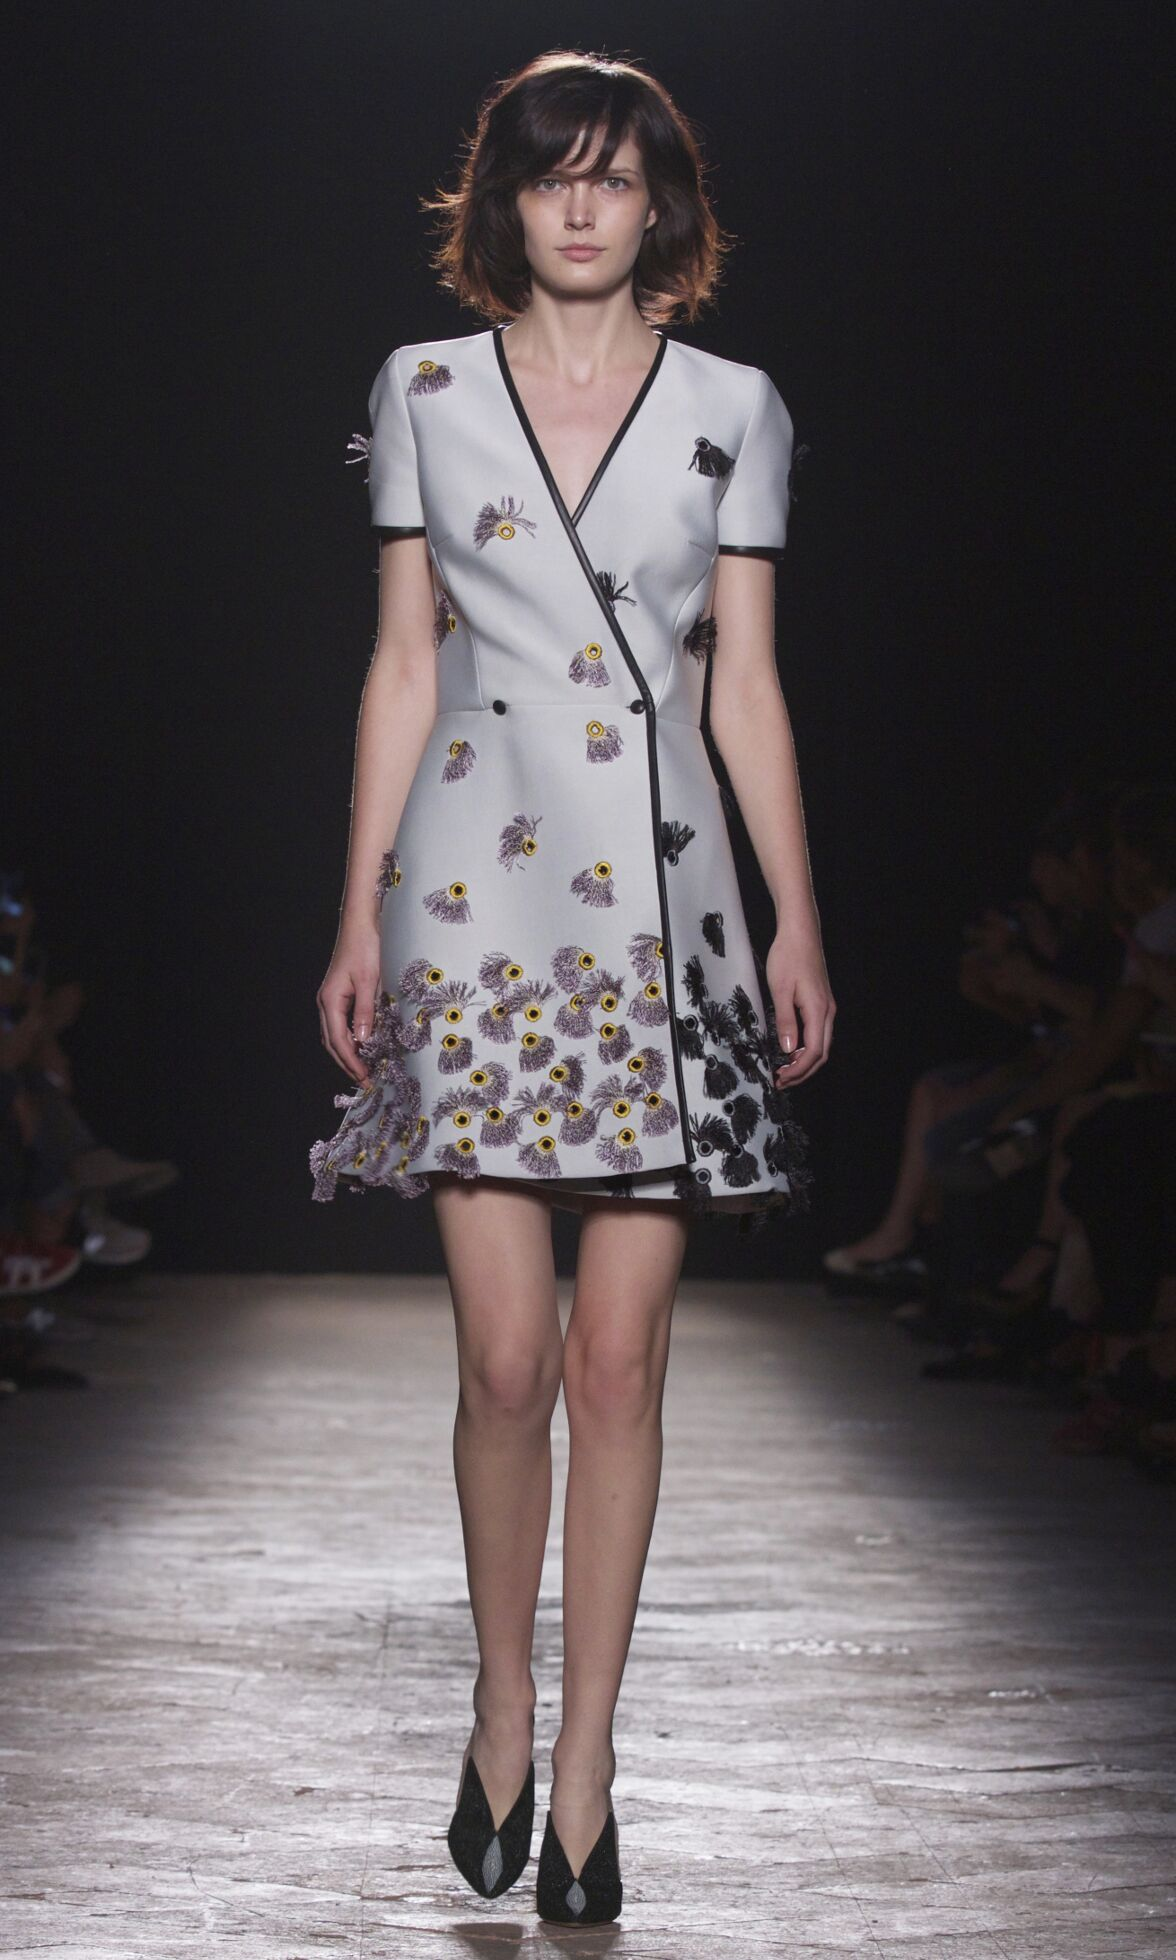 Summer 2014 Fashion Show Marco De Vincenzo